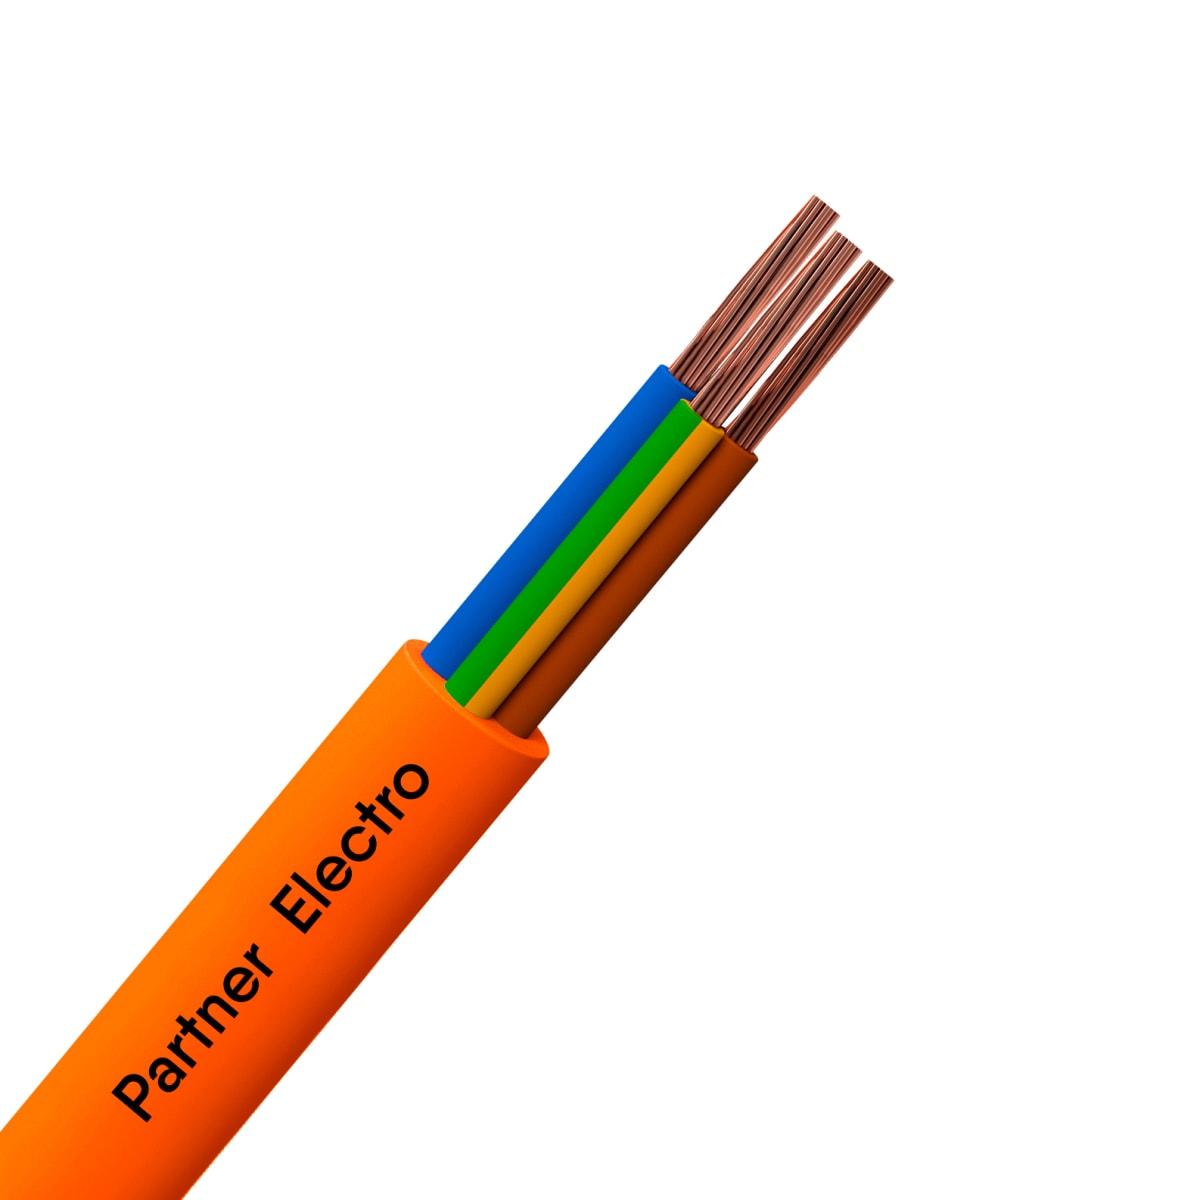 Провод Партнер-Электро ПВС 3х1.5, на отрез